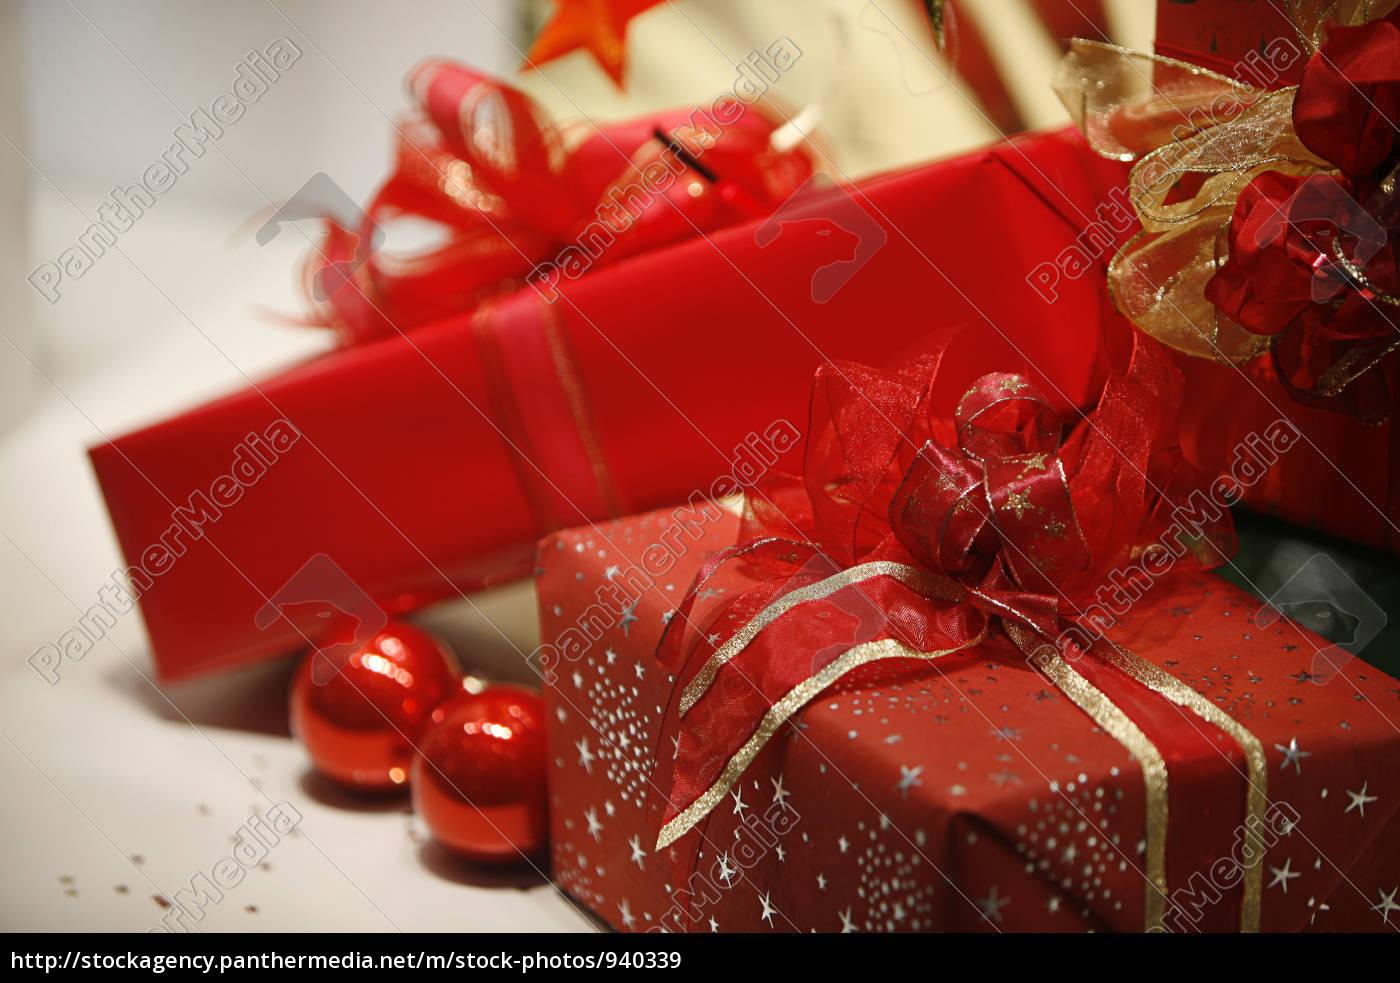 christmassy - 940339